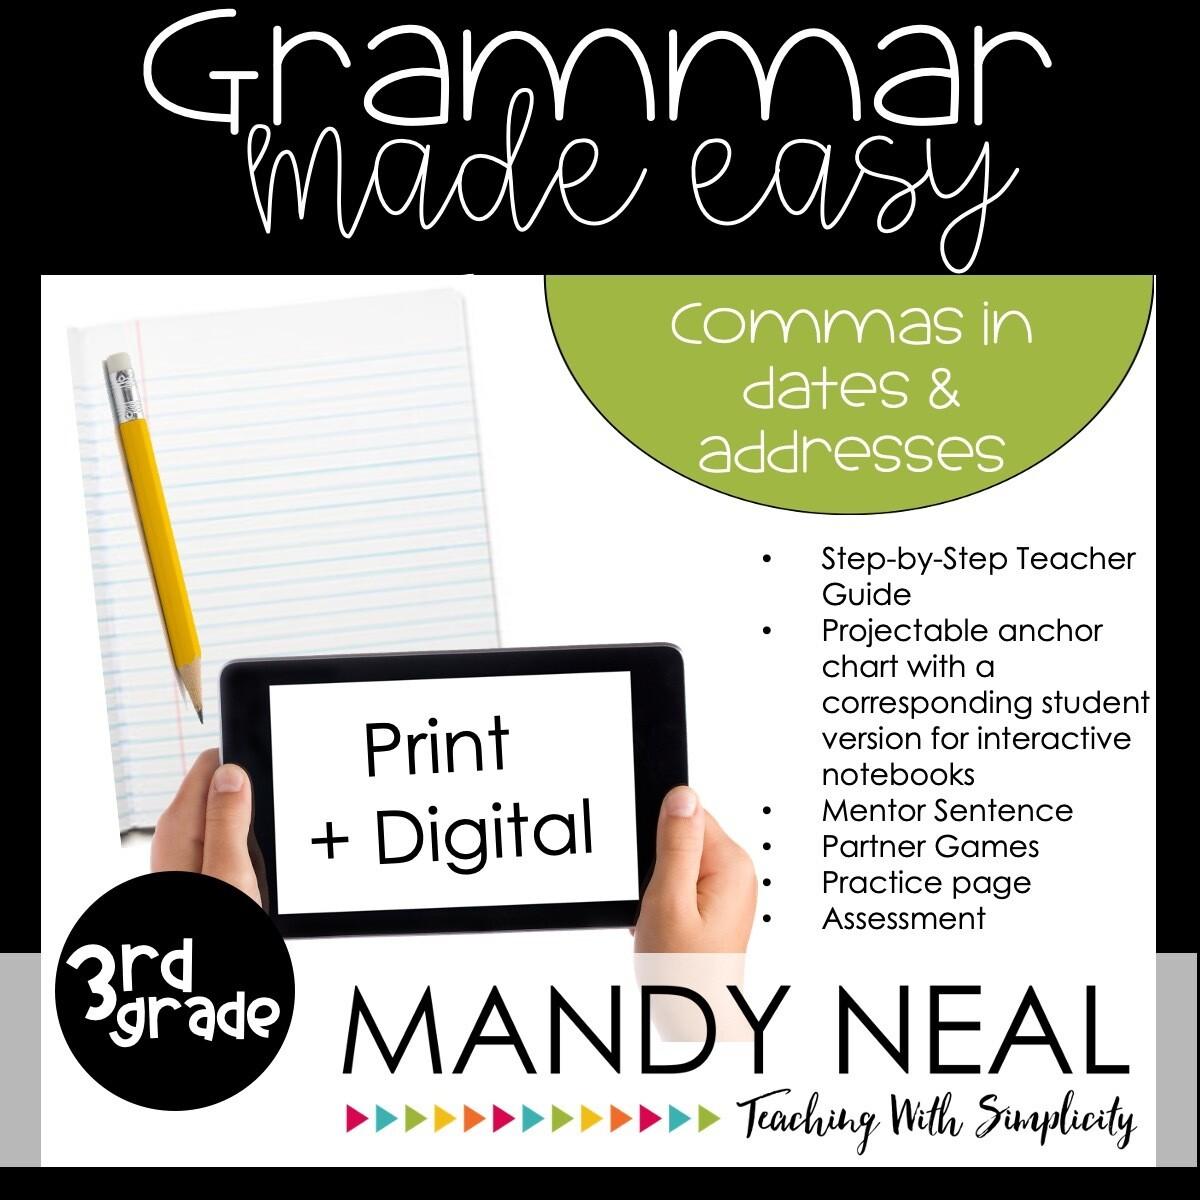 Print + Digital Third Grade Grammar Activities (Commas in Dates and Addresses)